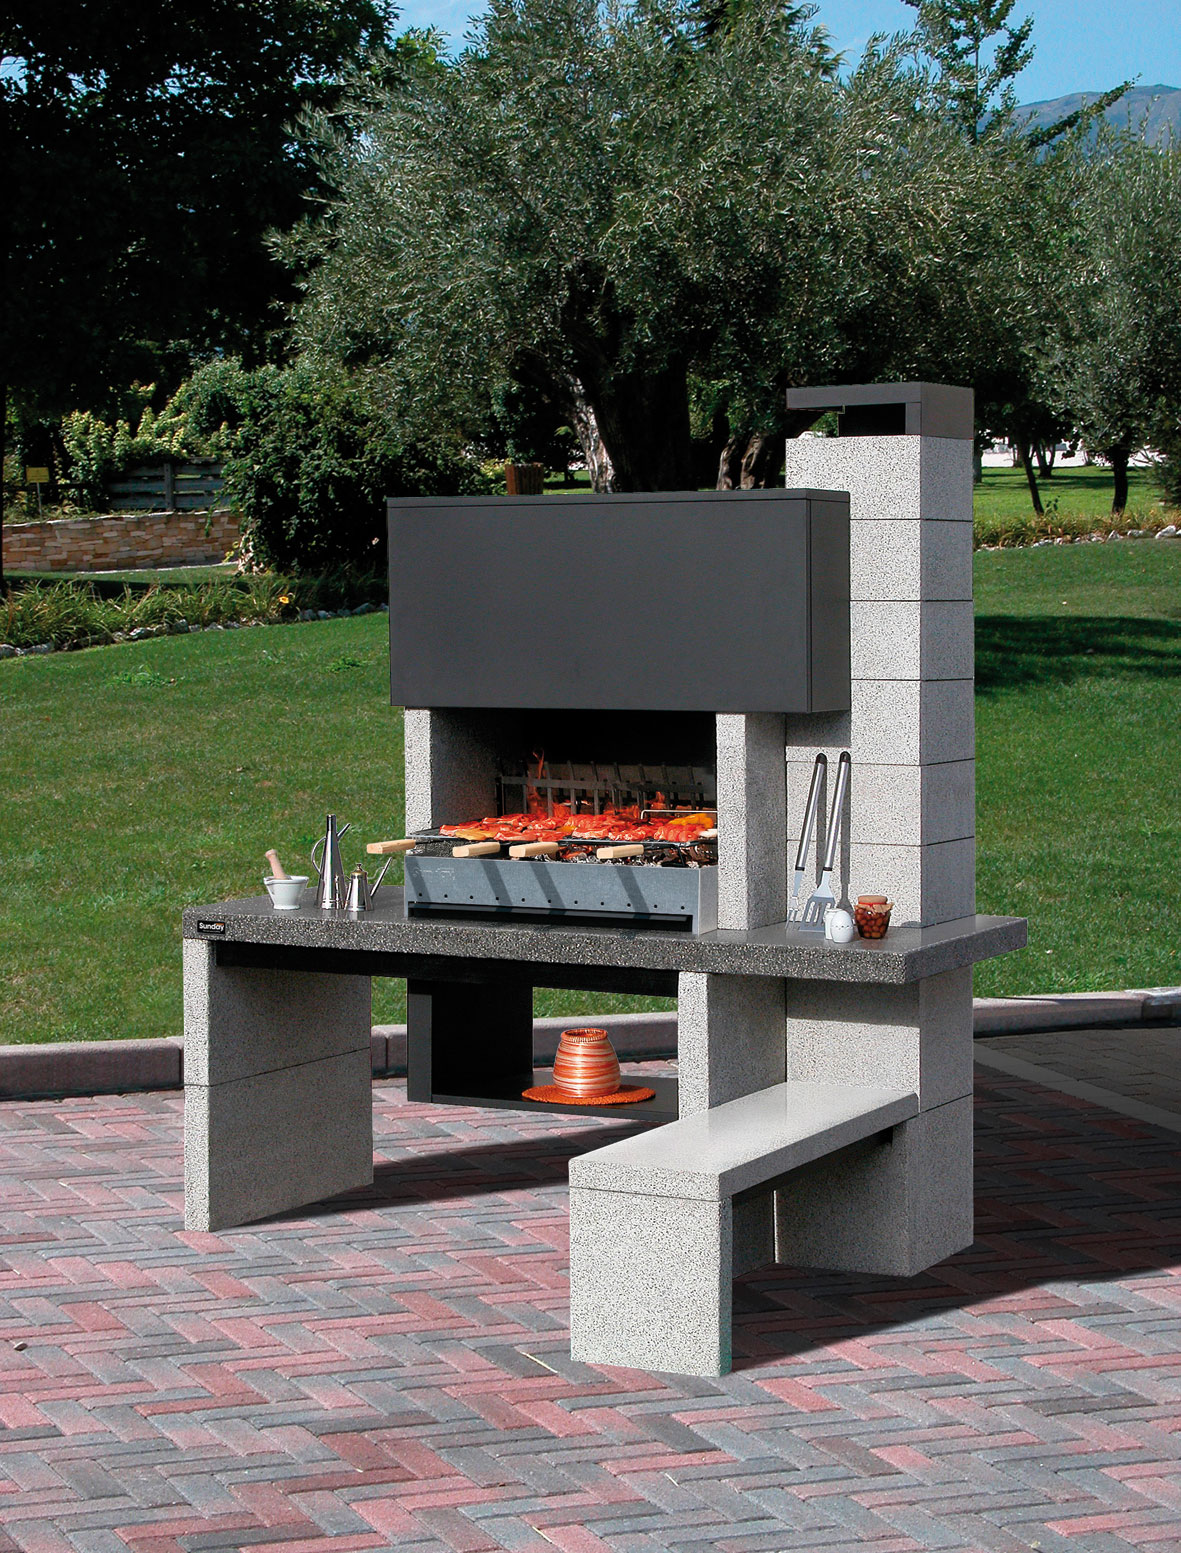 mcz gartengrill sunday newjersey. Black Bedroom Furniture Sets. Home Design Ideas